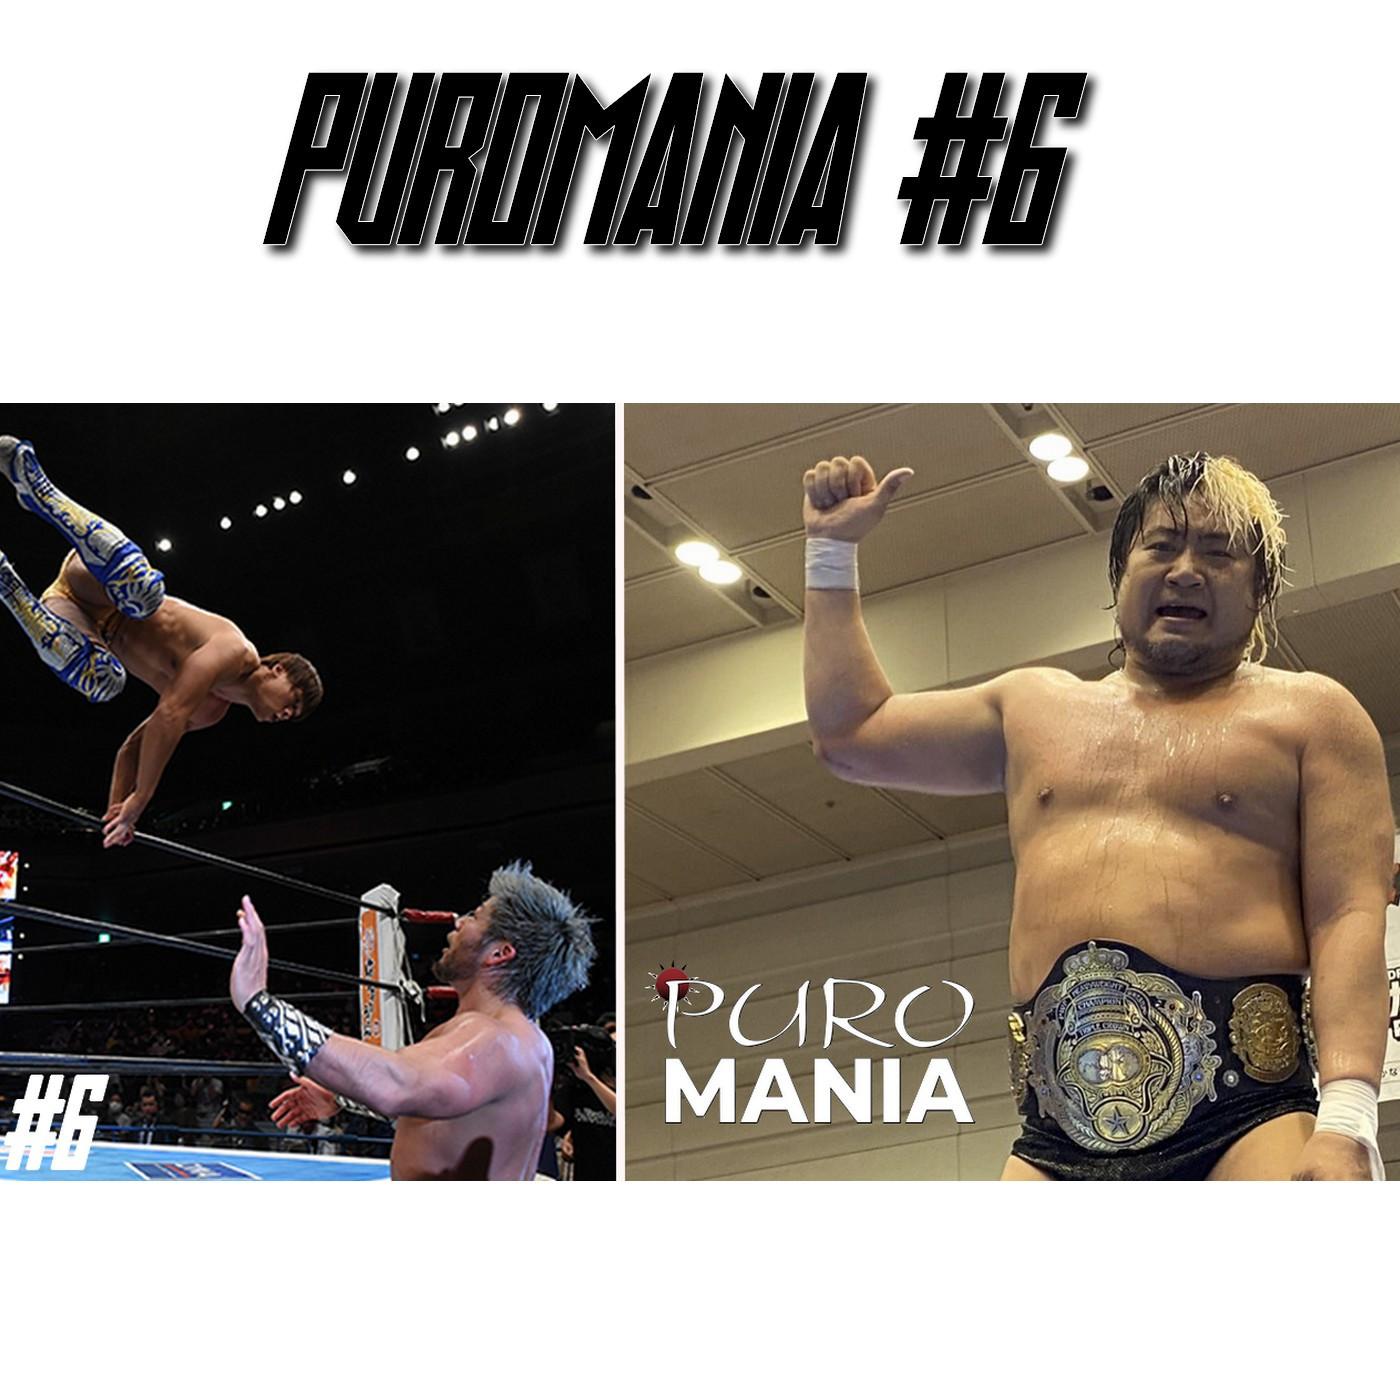 PuroMania #6 Review G1 CLIMAX 30 Day 14 à la Final / AJPW TITLE MATCH